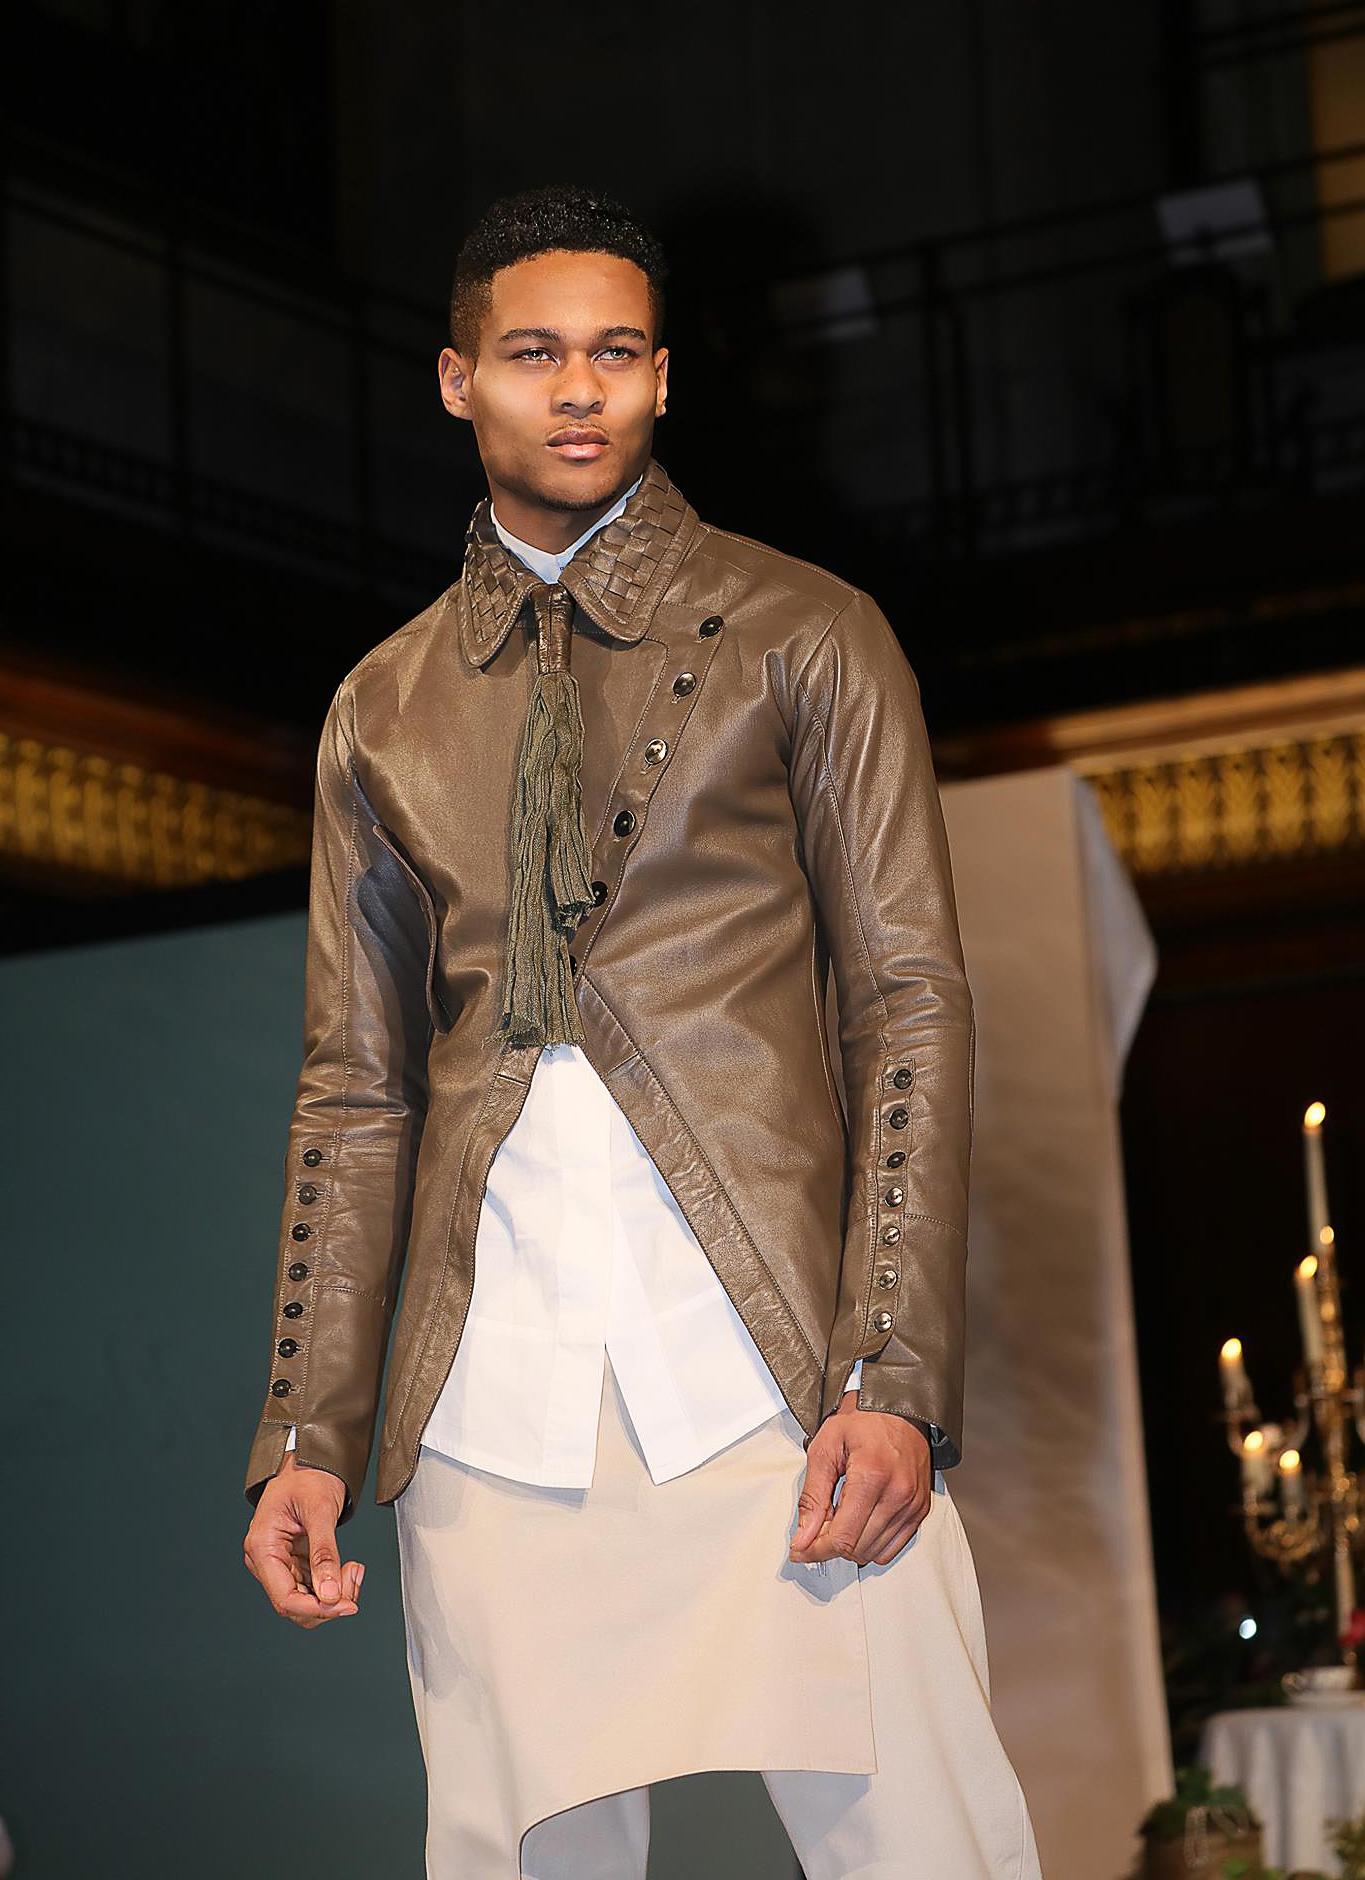 Shine-Male-Model-Terone-London-Catwalk-Editoral-02.jpg#asset:44525